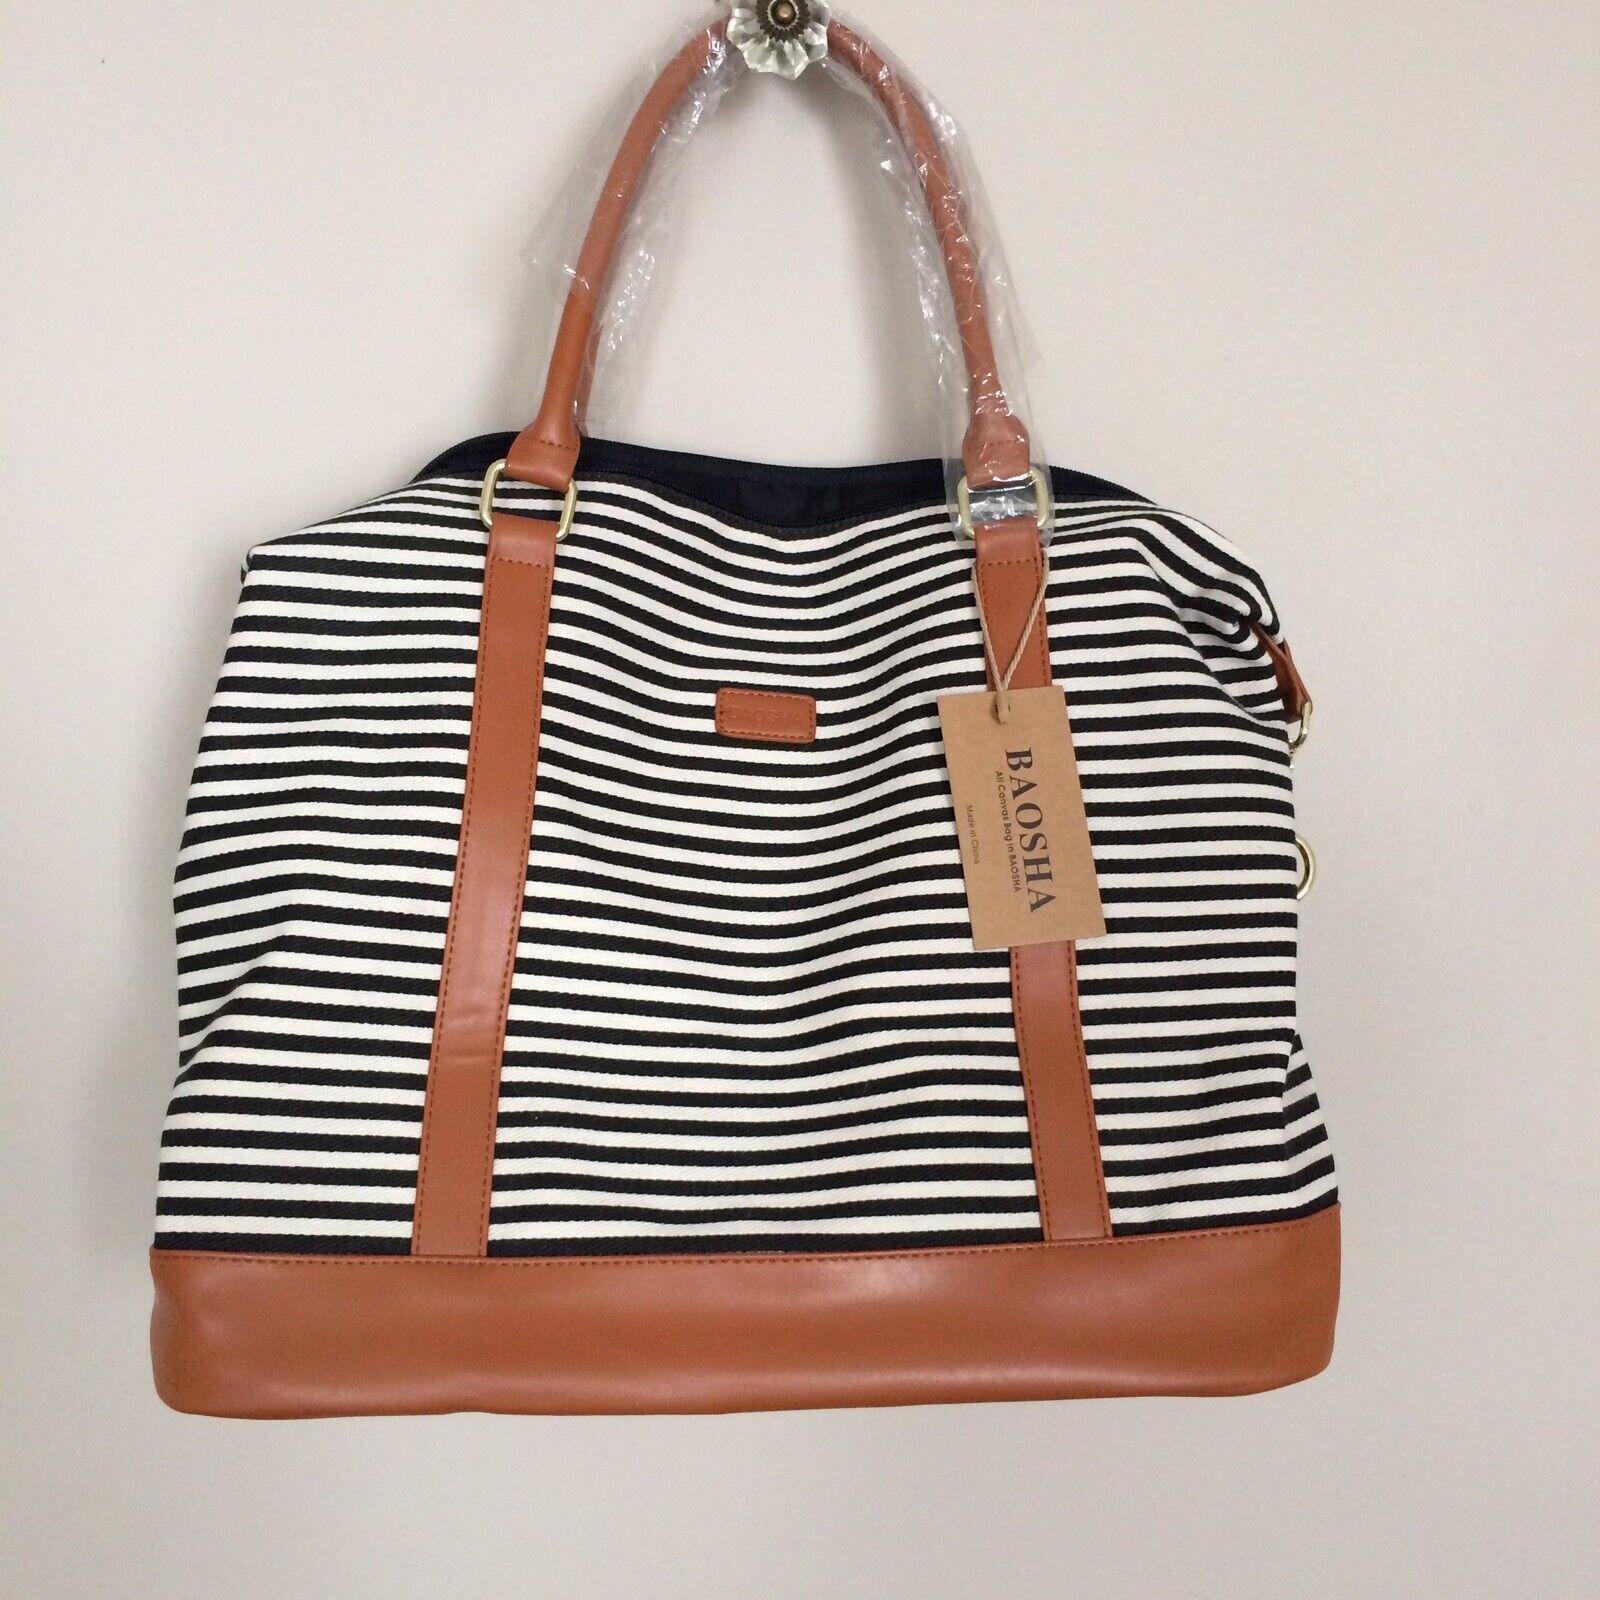 Women's Baosha Travel Handbag Shoulder Duffel Tote Carry On